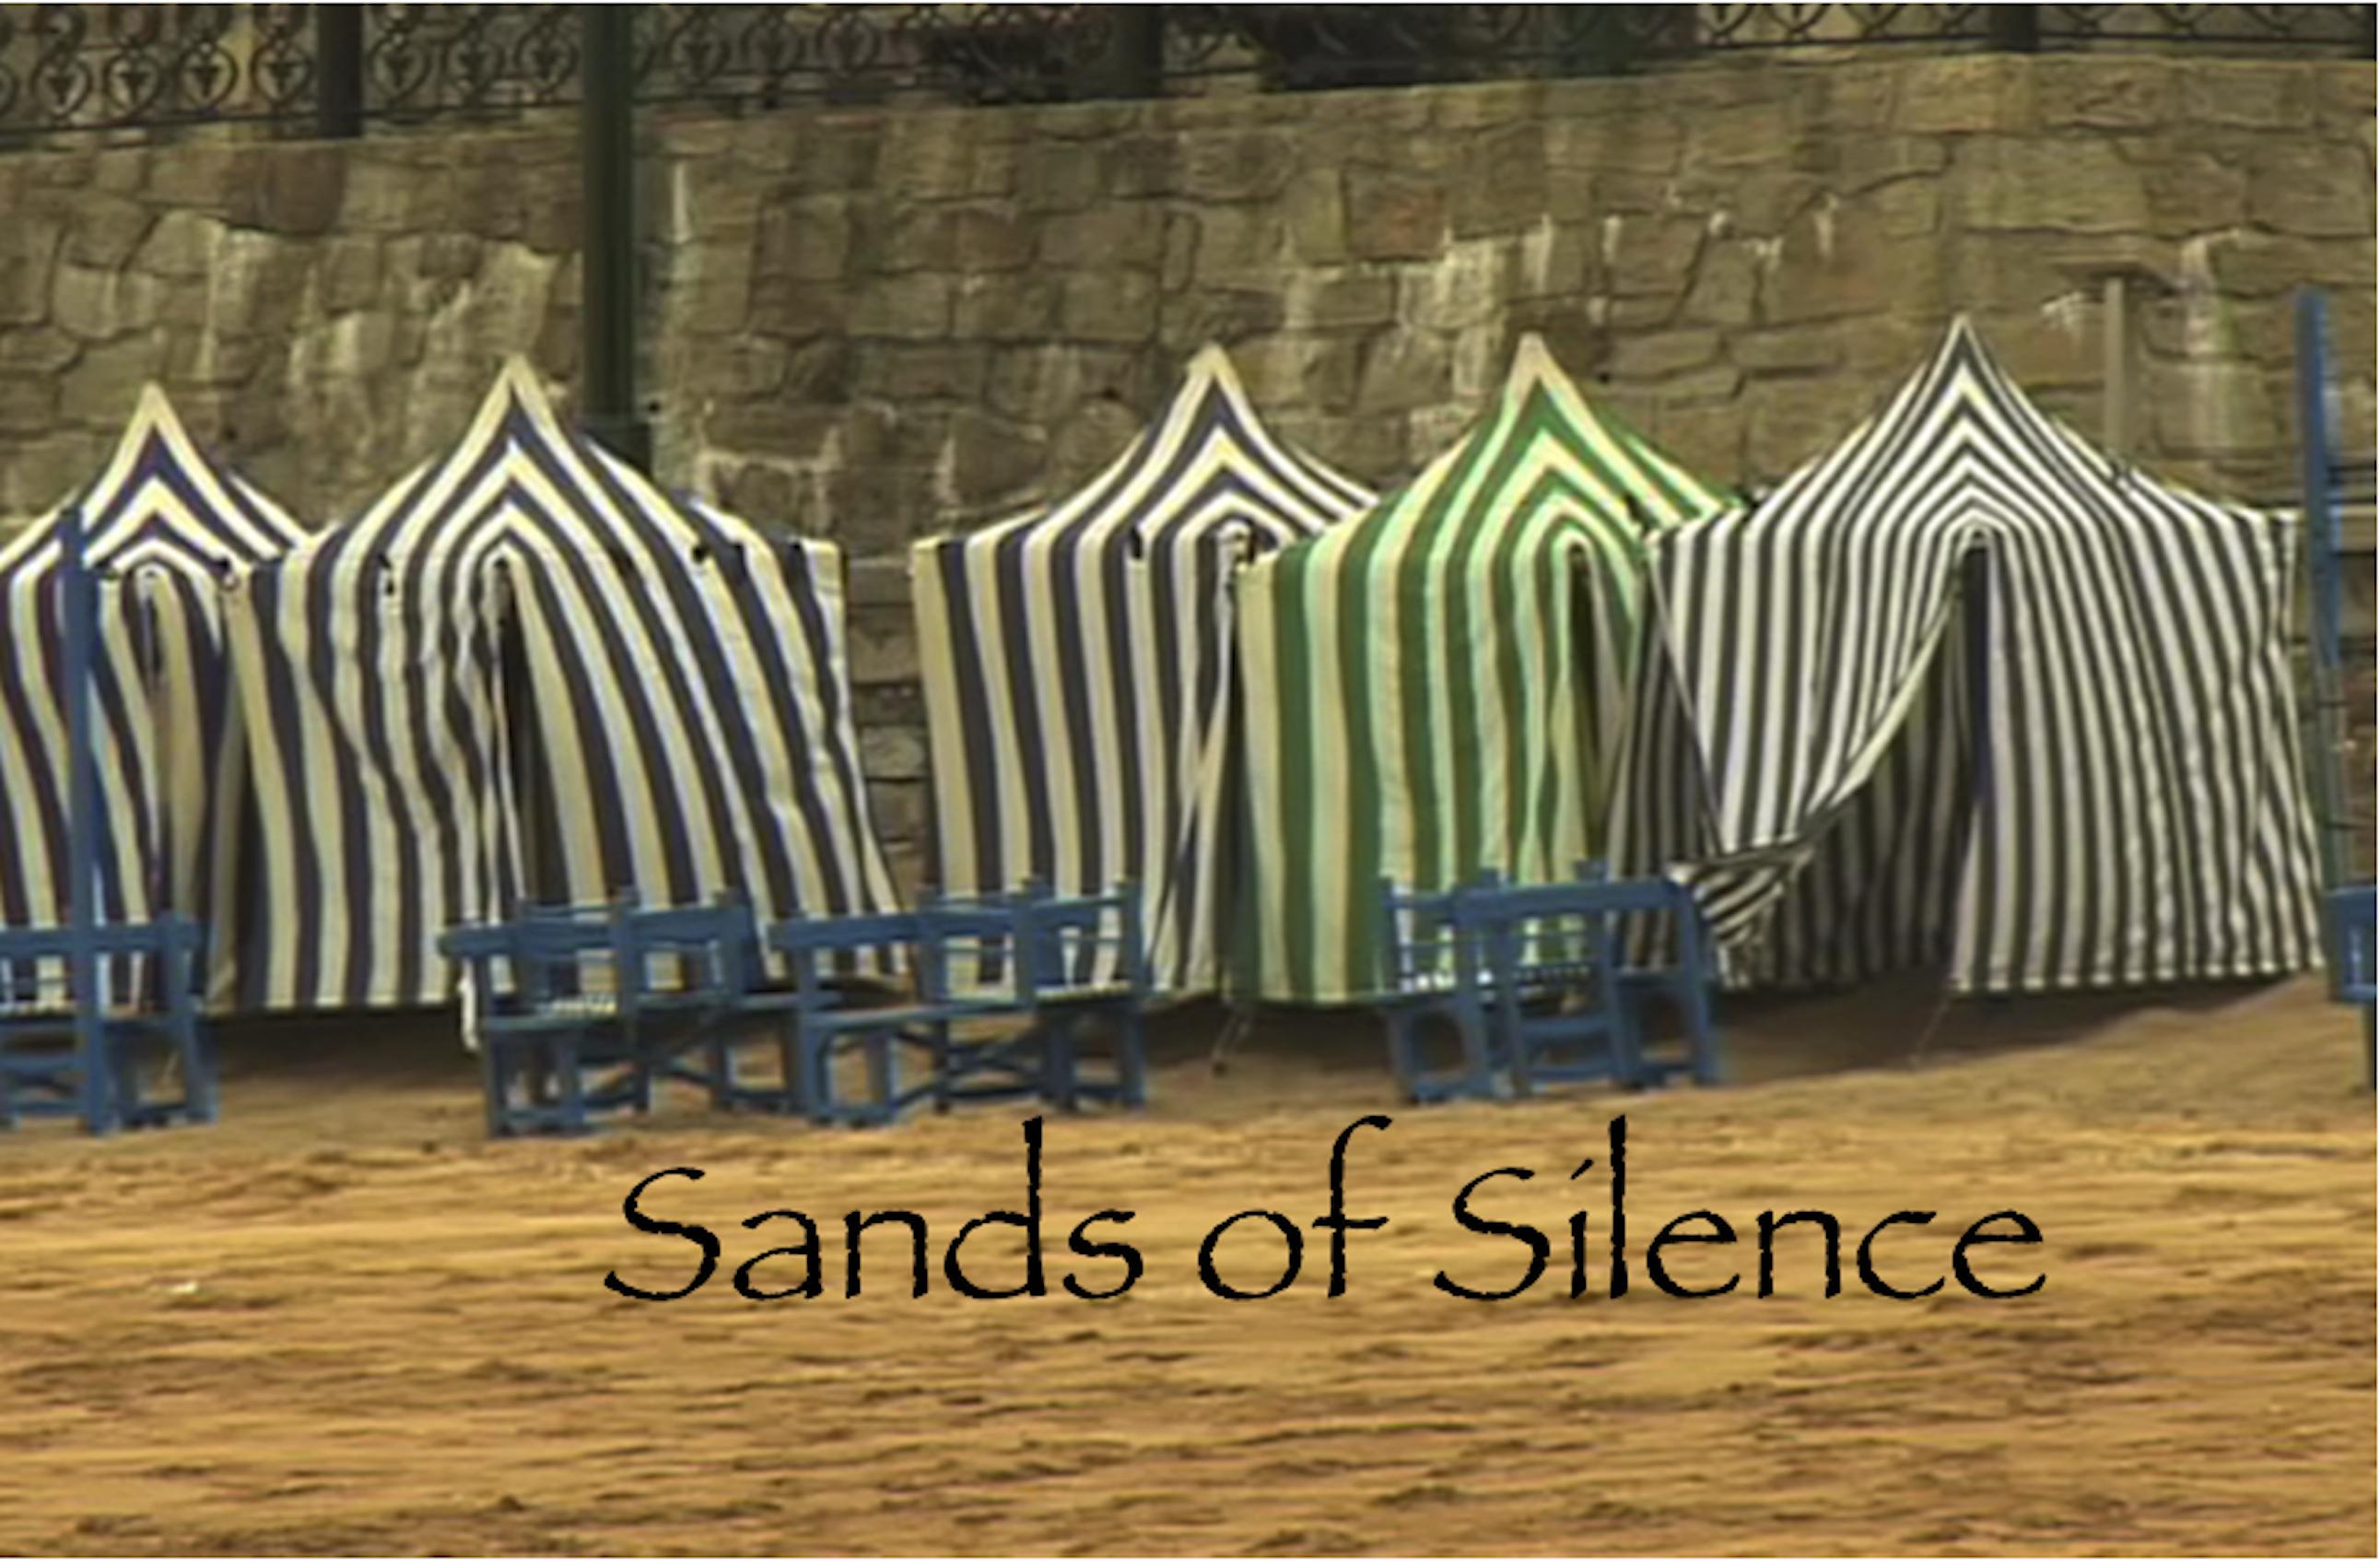 Sands_of_Silence_Still_Cabana_Title.jpg